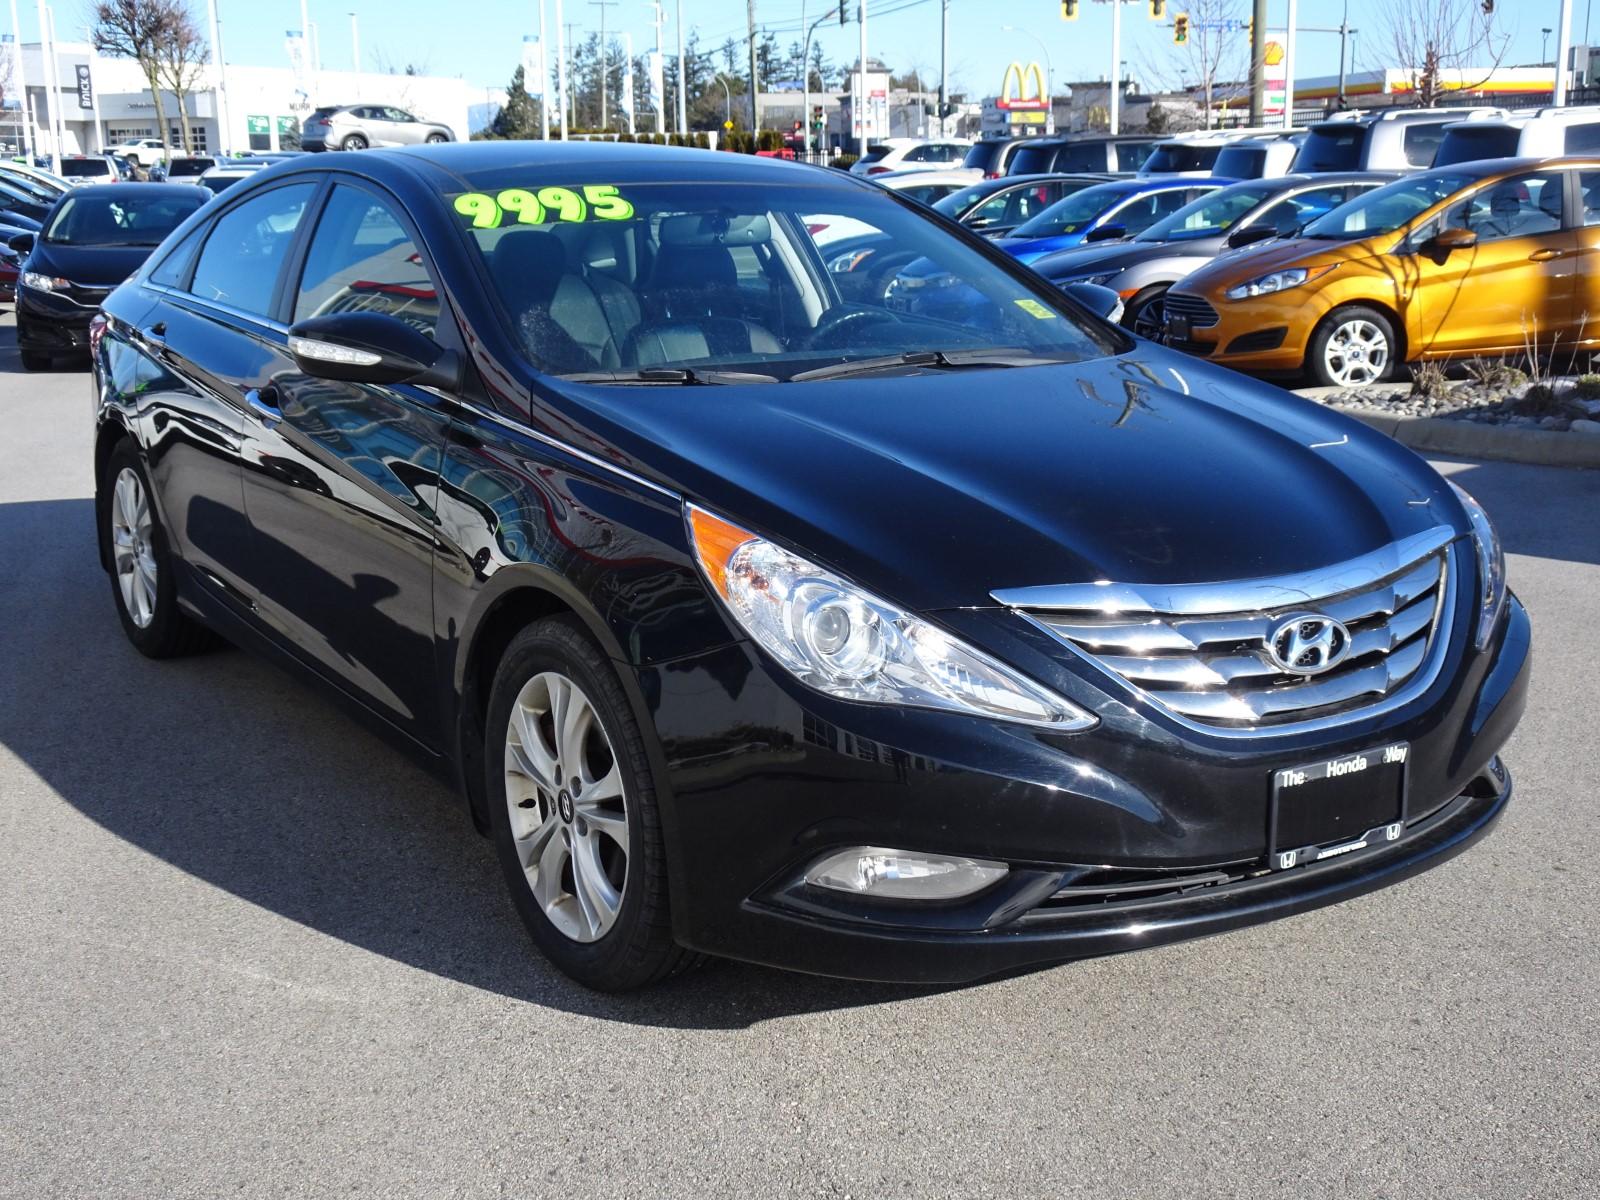 Used 2013 Hyundai Sonata in Abbotsford,BC